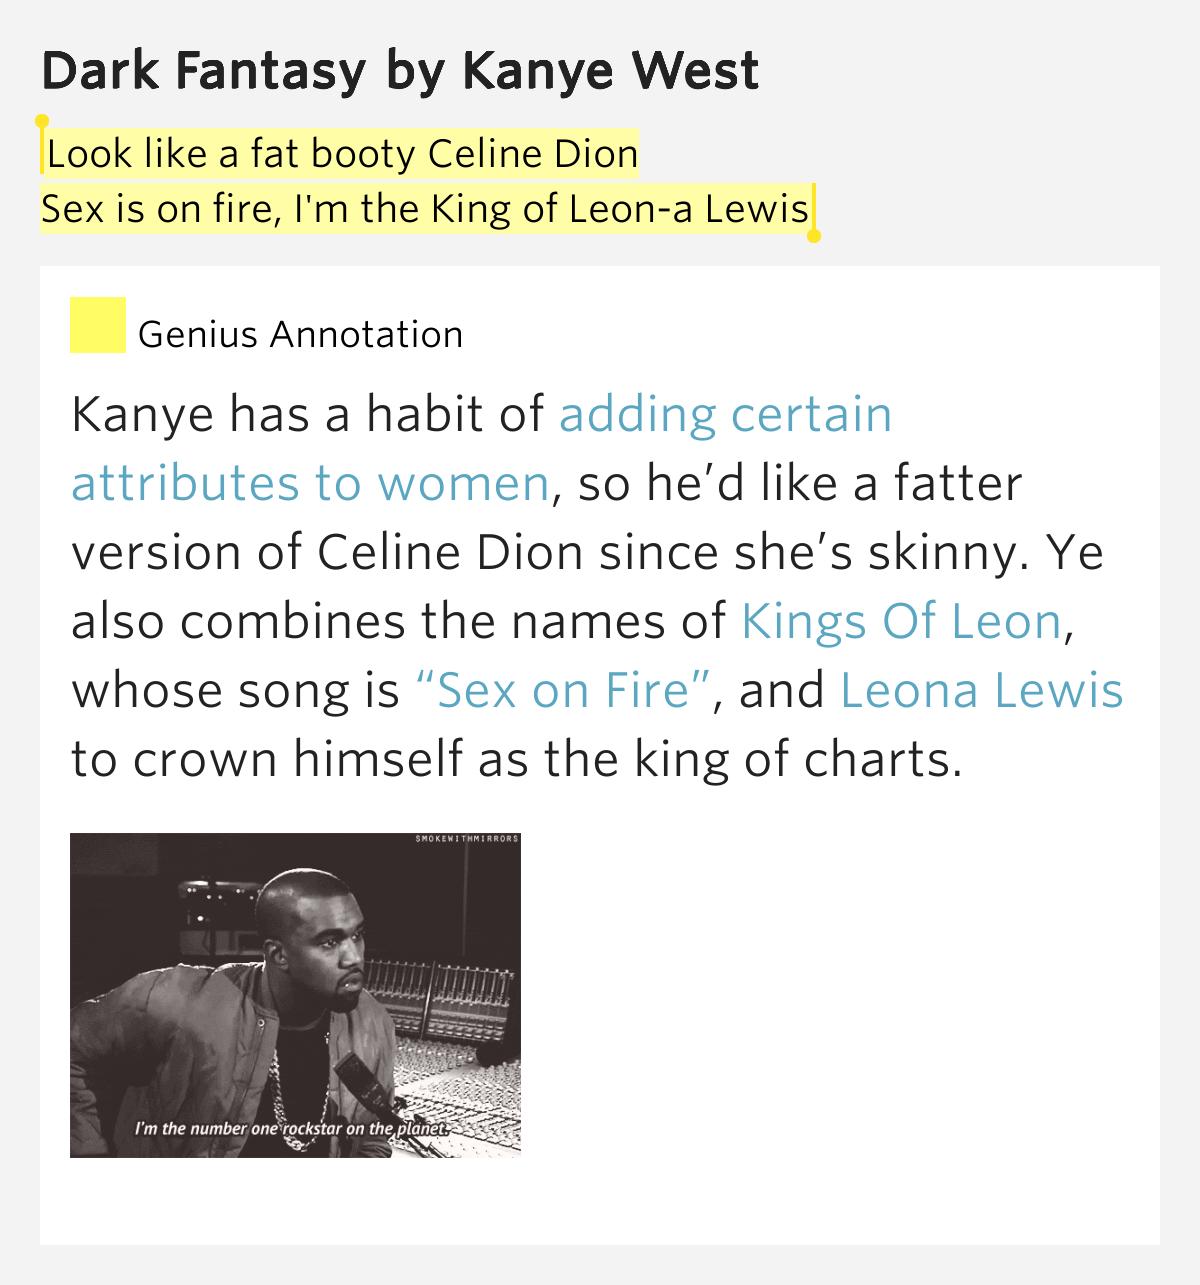 sex on fire lyrics meaning